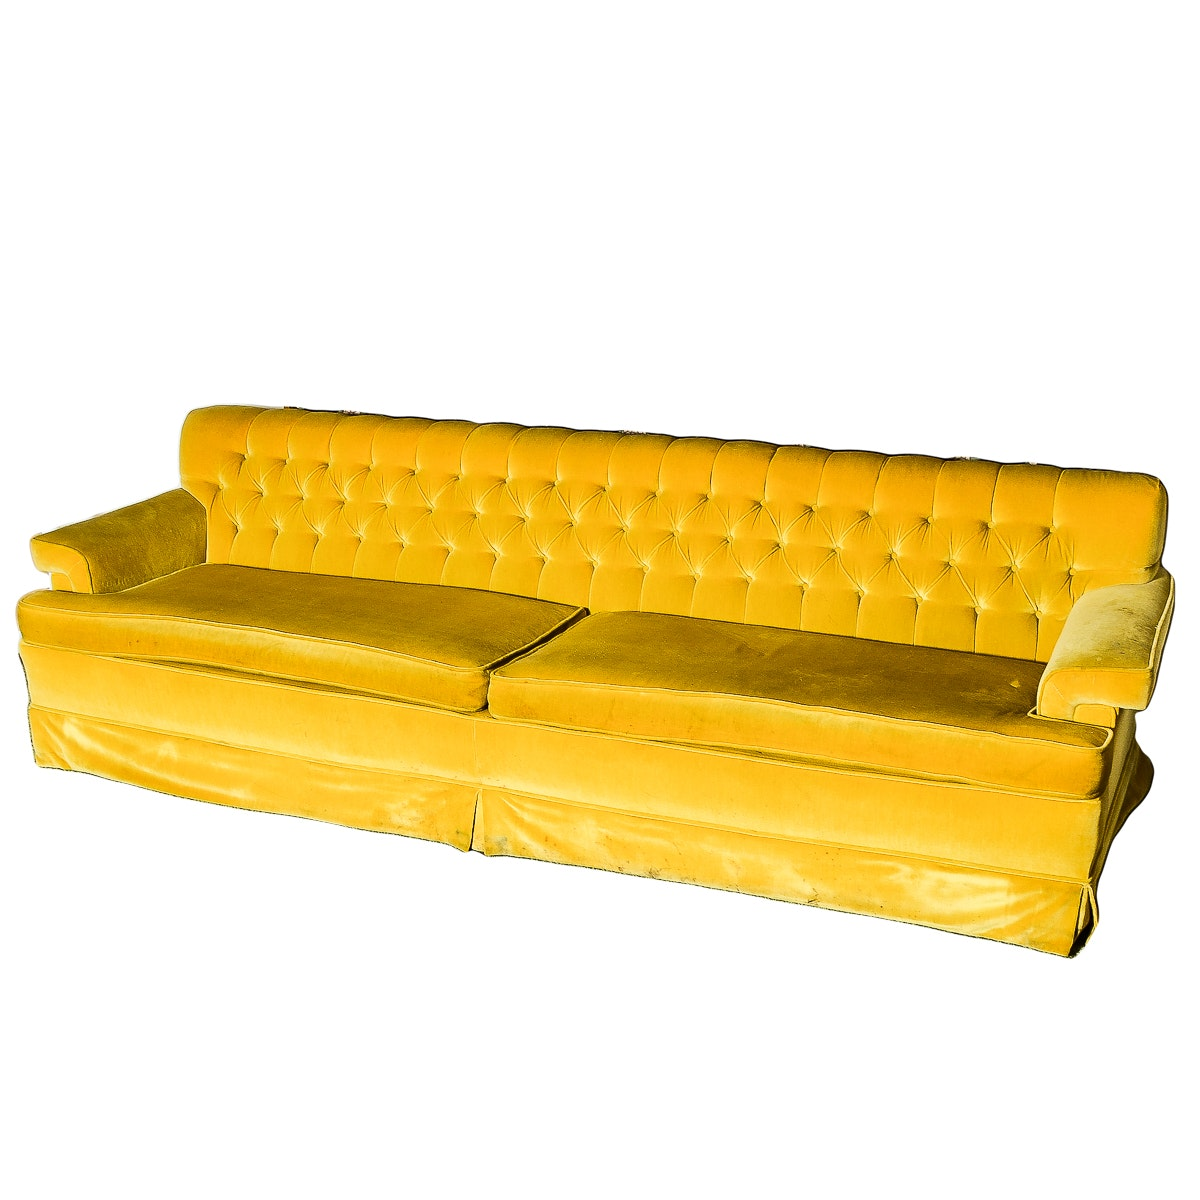 Vintage Mustard Yellow Velvet Couch ...